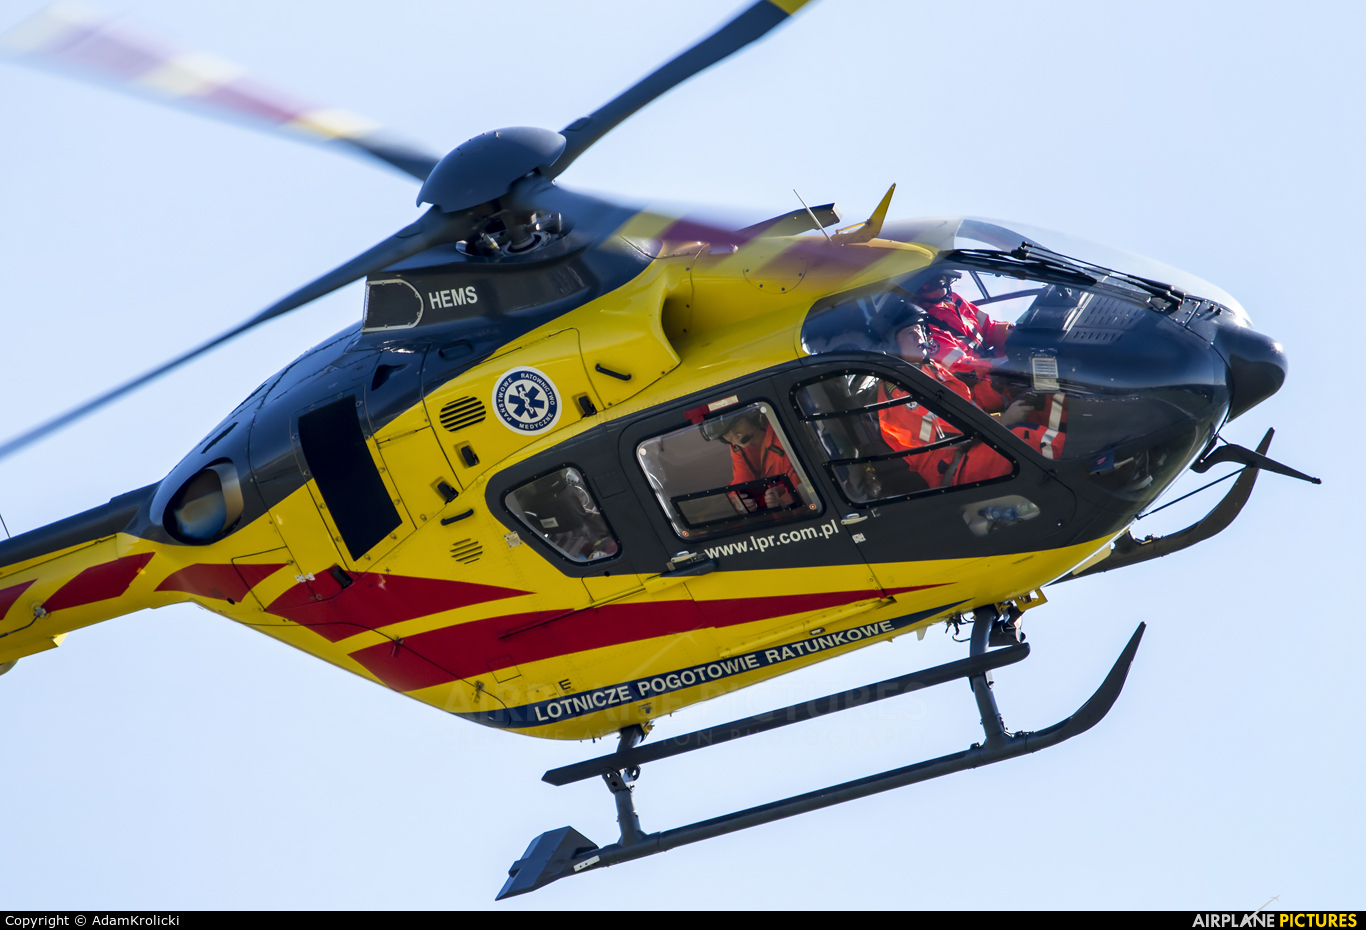 Polish Medical Air Rescue - Lotnicze Pogotowie Ratunkowe SP-HXP aircraft at Bielsko-Biała - Aleksandrowice